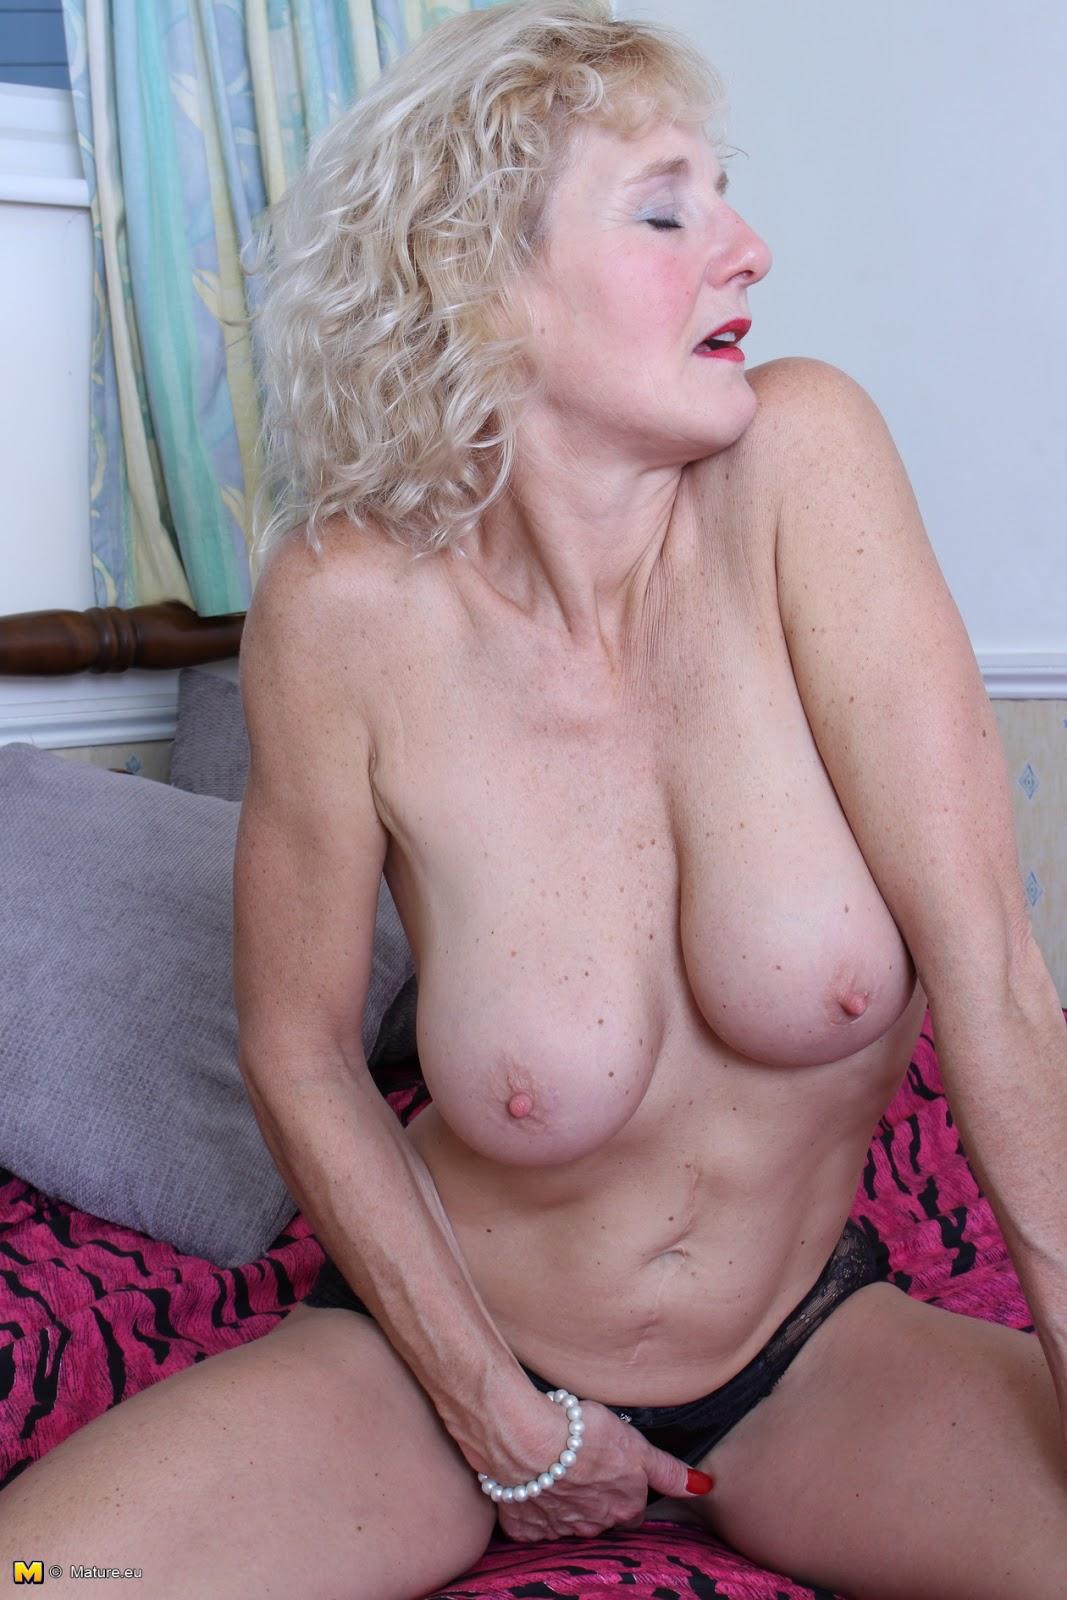 Archiveofoldwomen hot nude photos